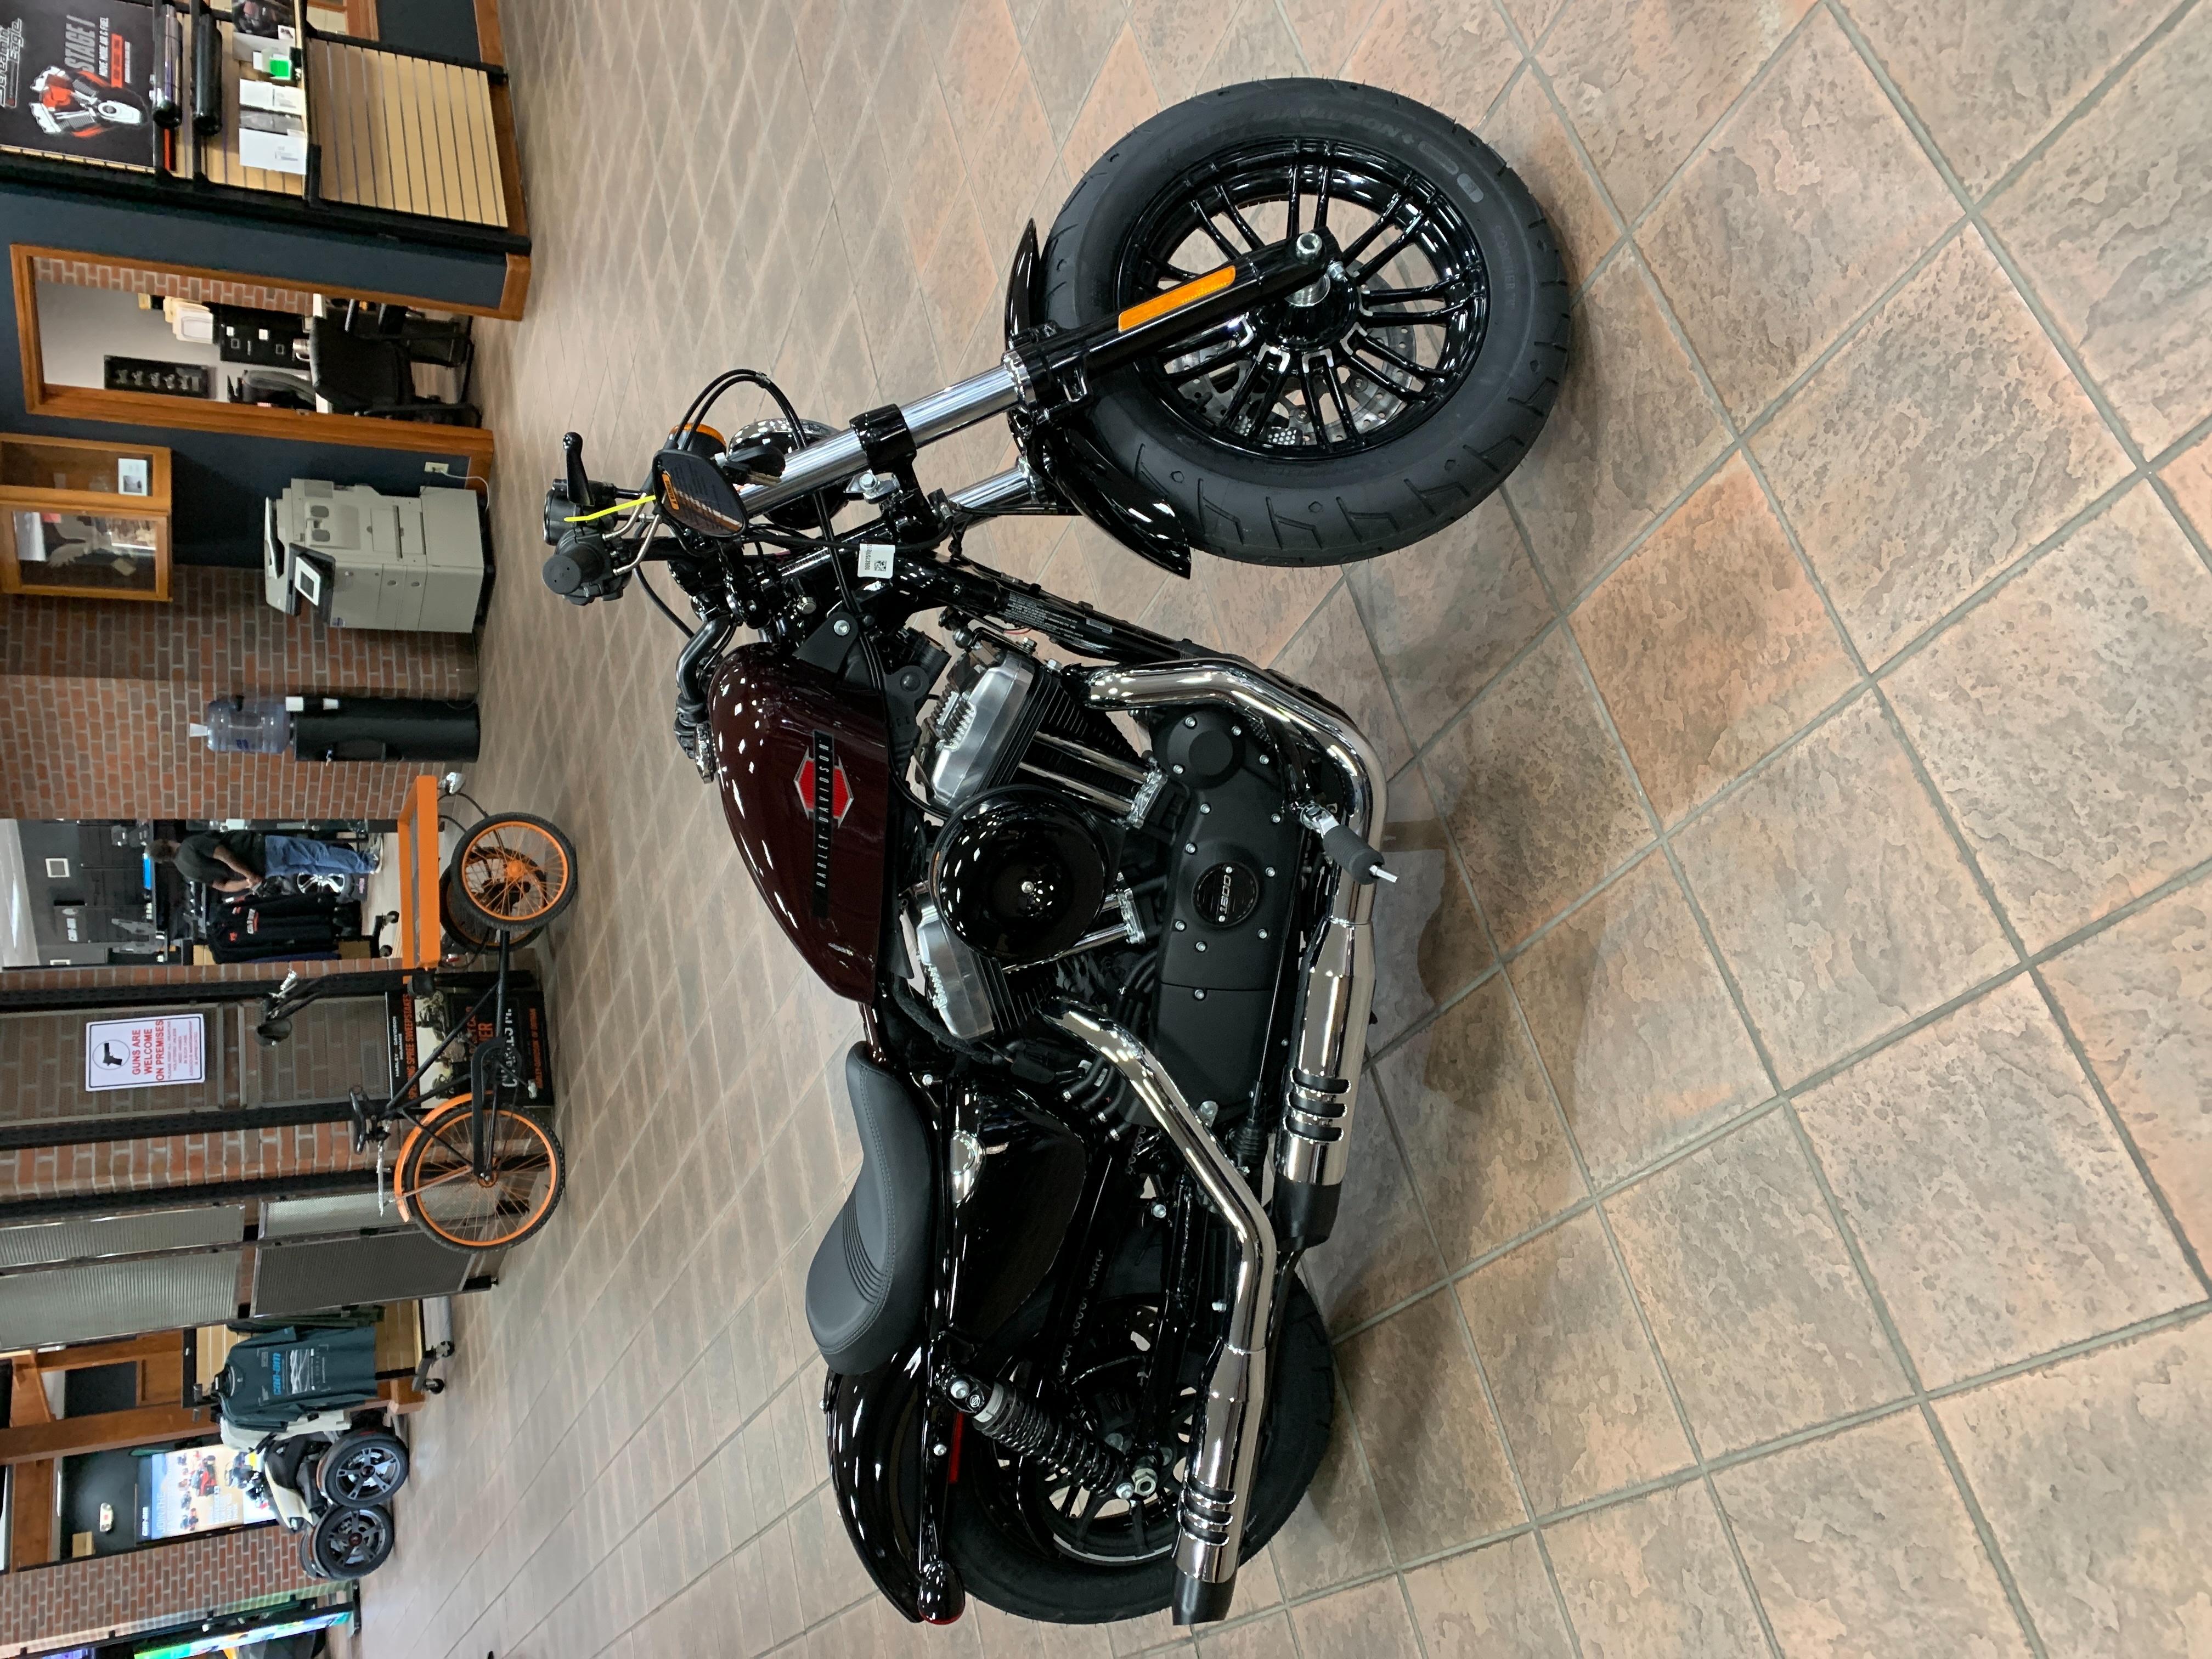 2021 Harley-Davidson Cruiser XL 1200X Forty-Eight at Harley-Davidson of Dothan